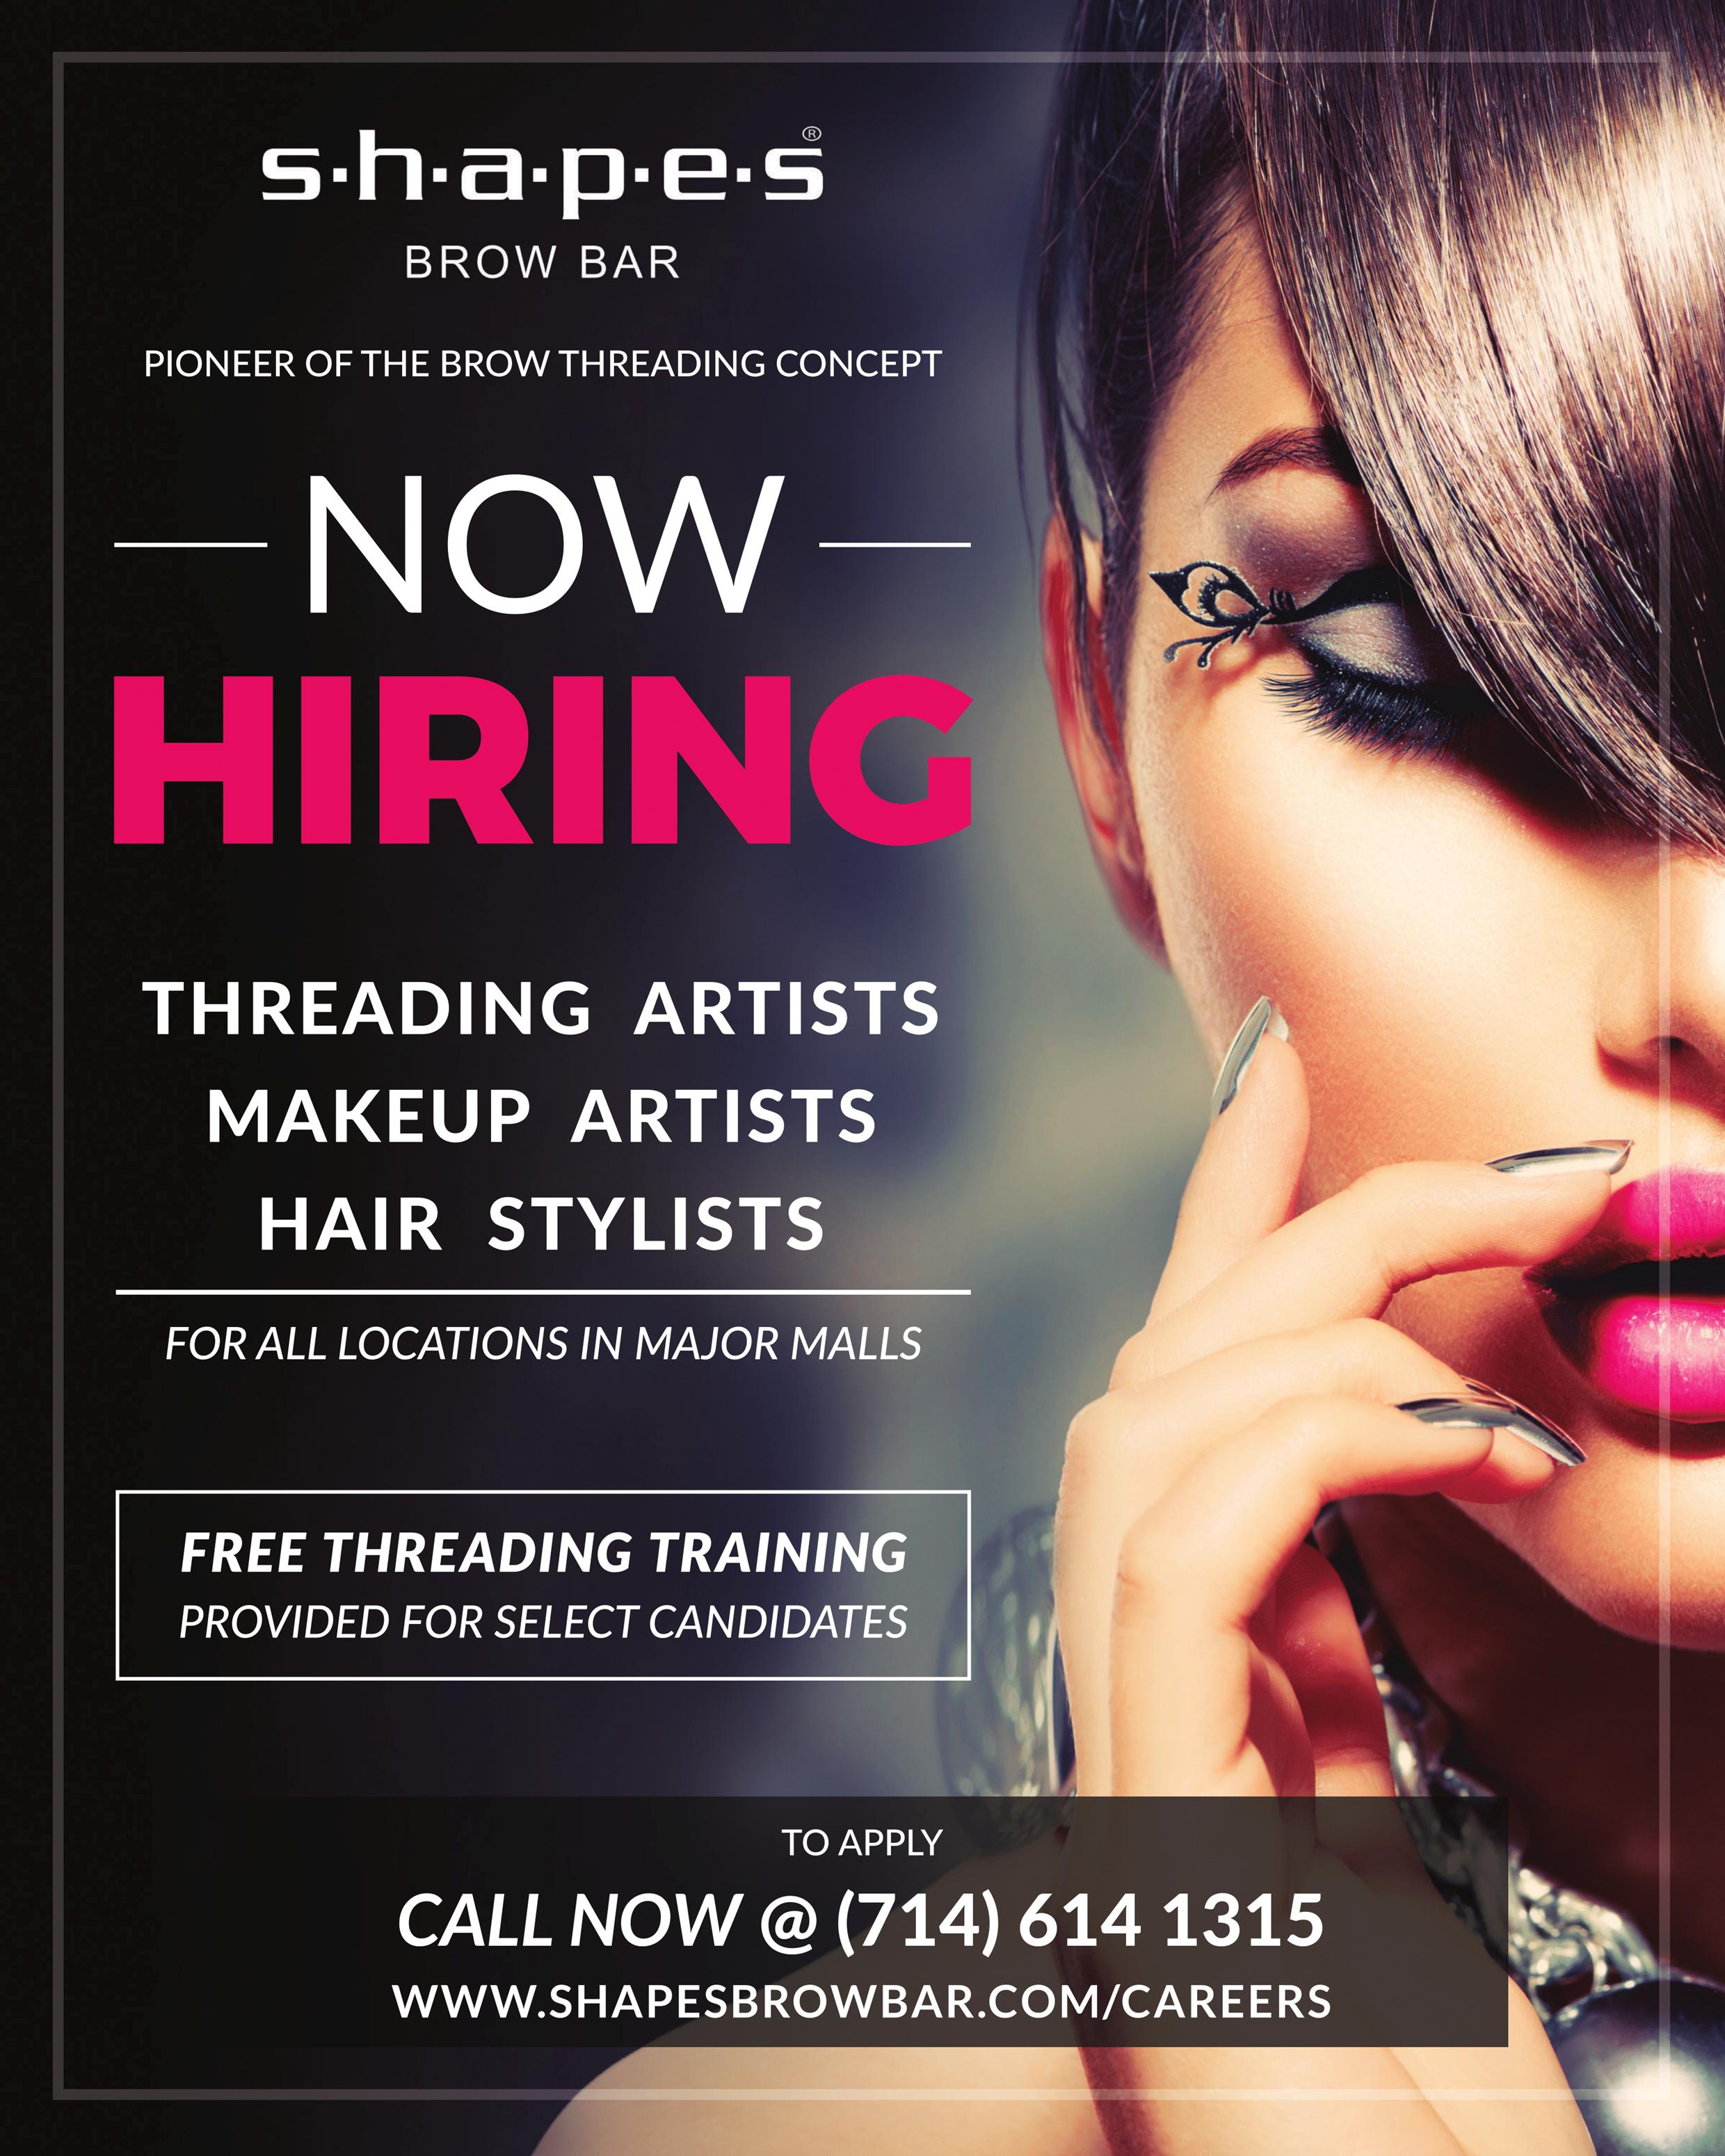 Eyebrow Threading Specialist Job in Morrow, GA by Shapes